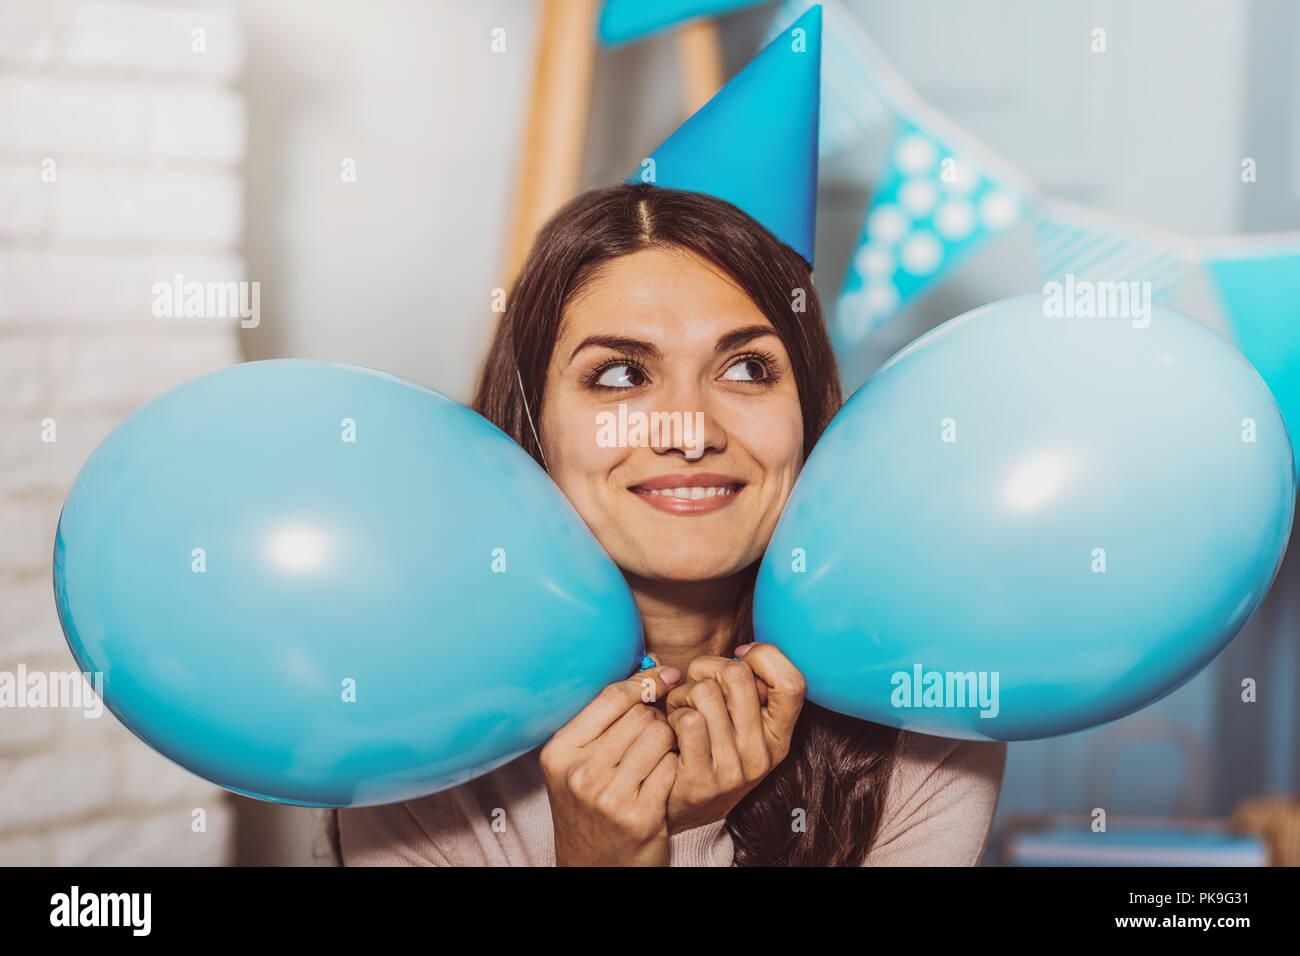 Ziemlich jolly Frau träumt über Birthday Party Stockbild